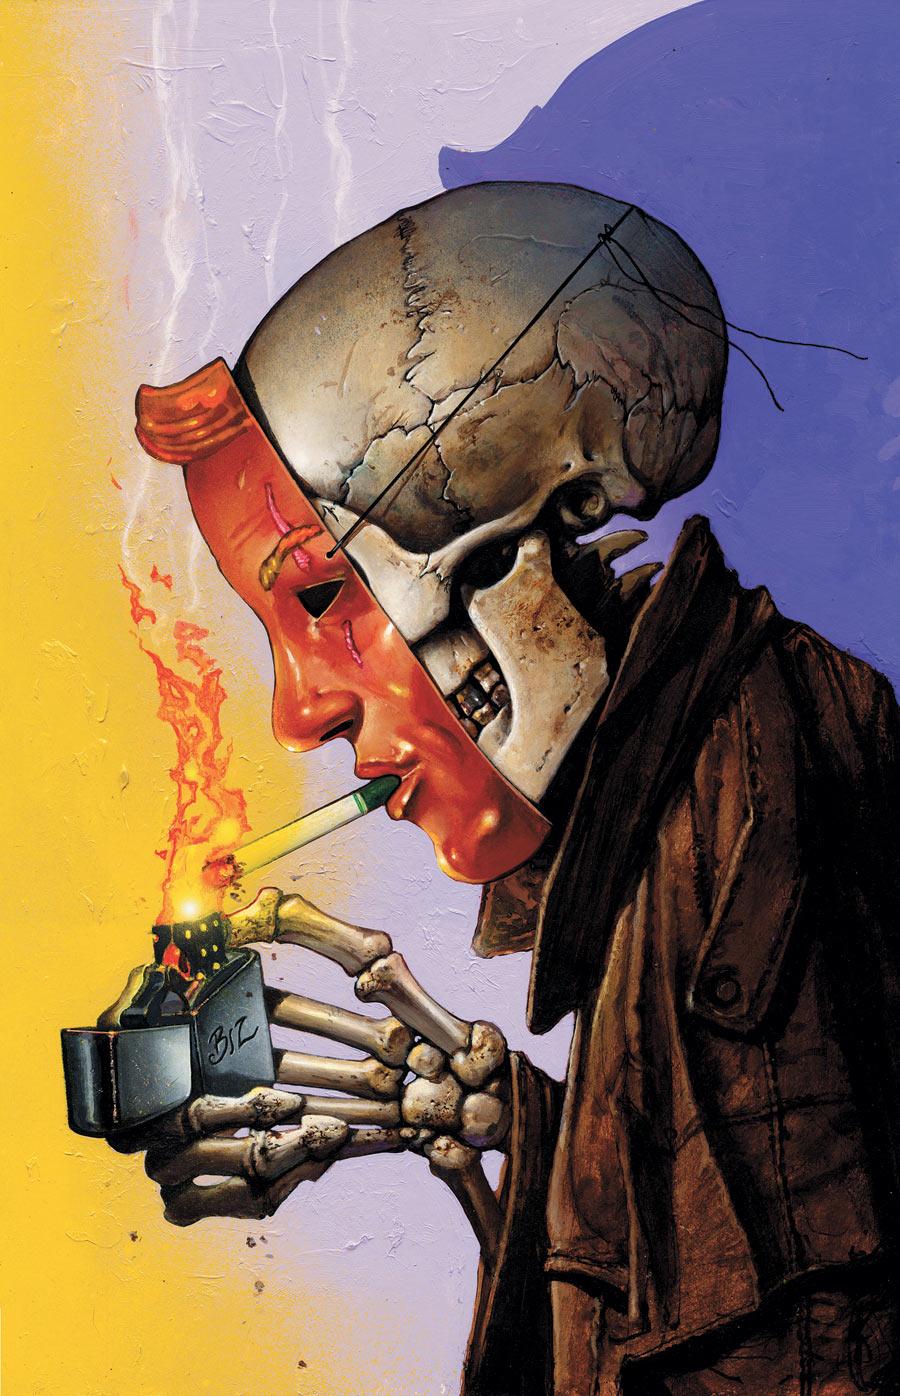 Death and Cigarettes - Part 1